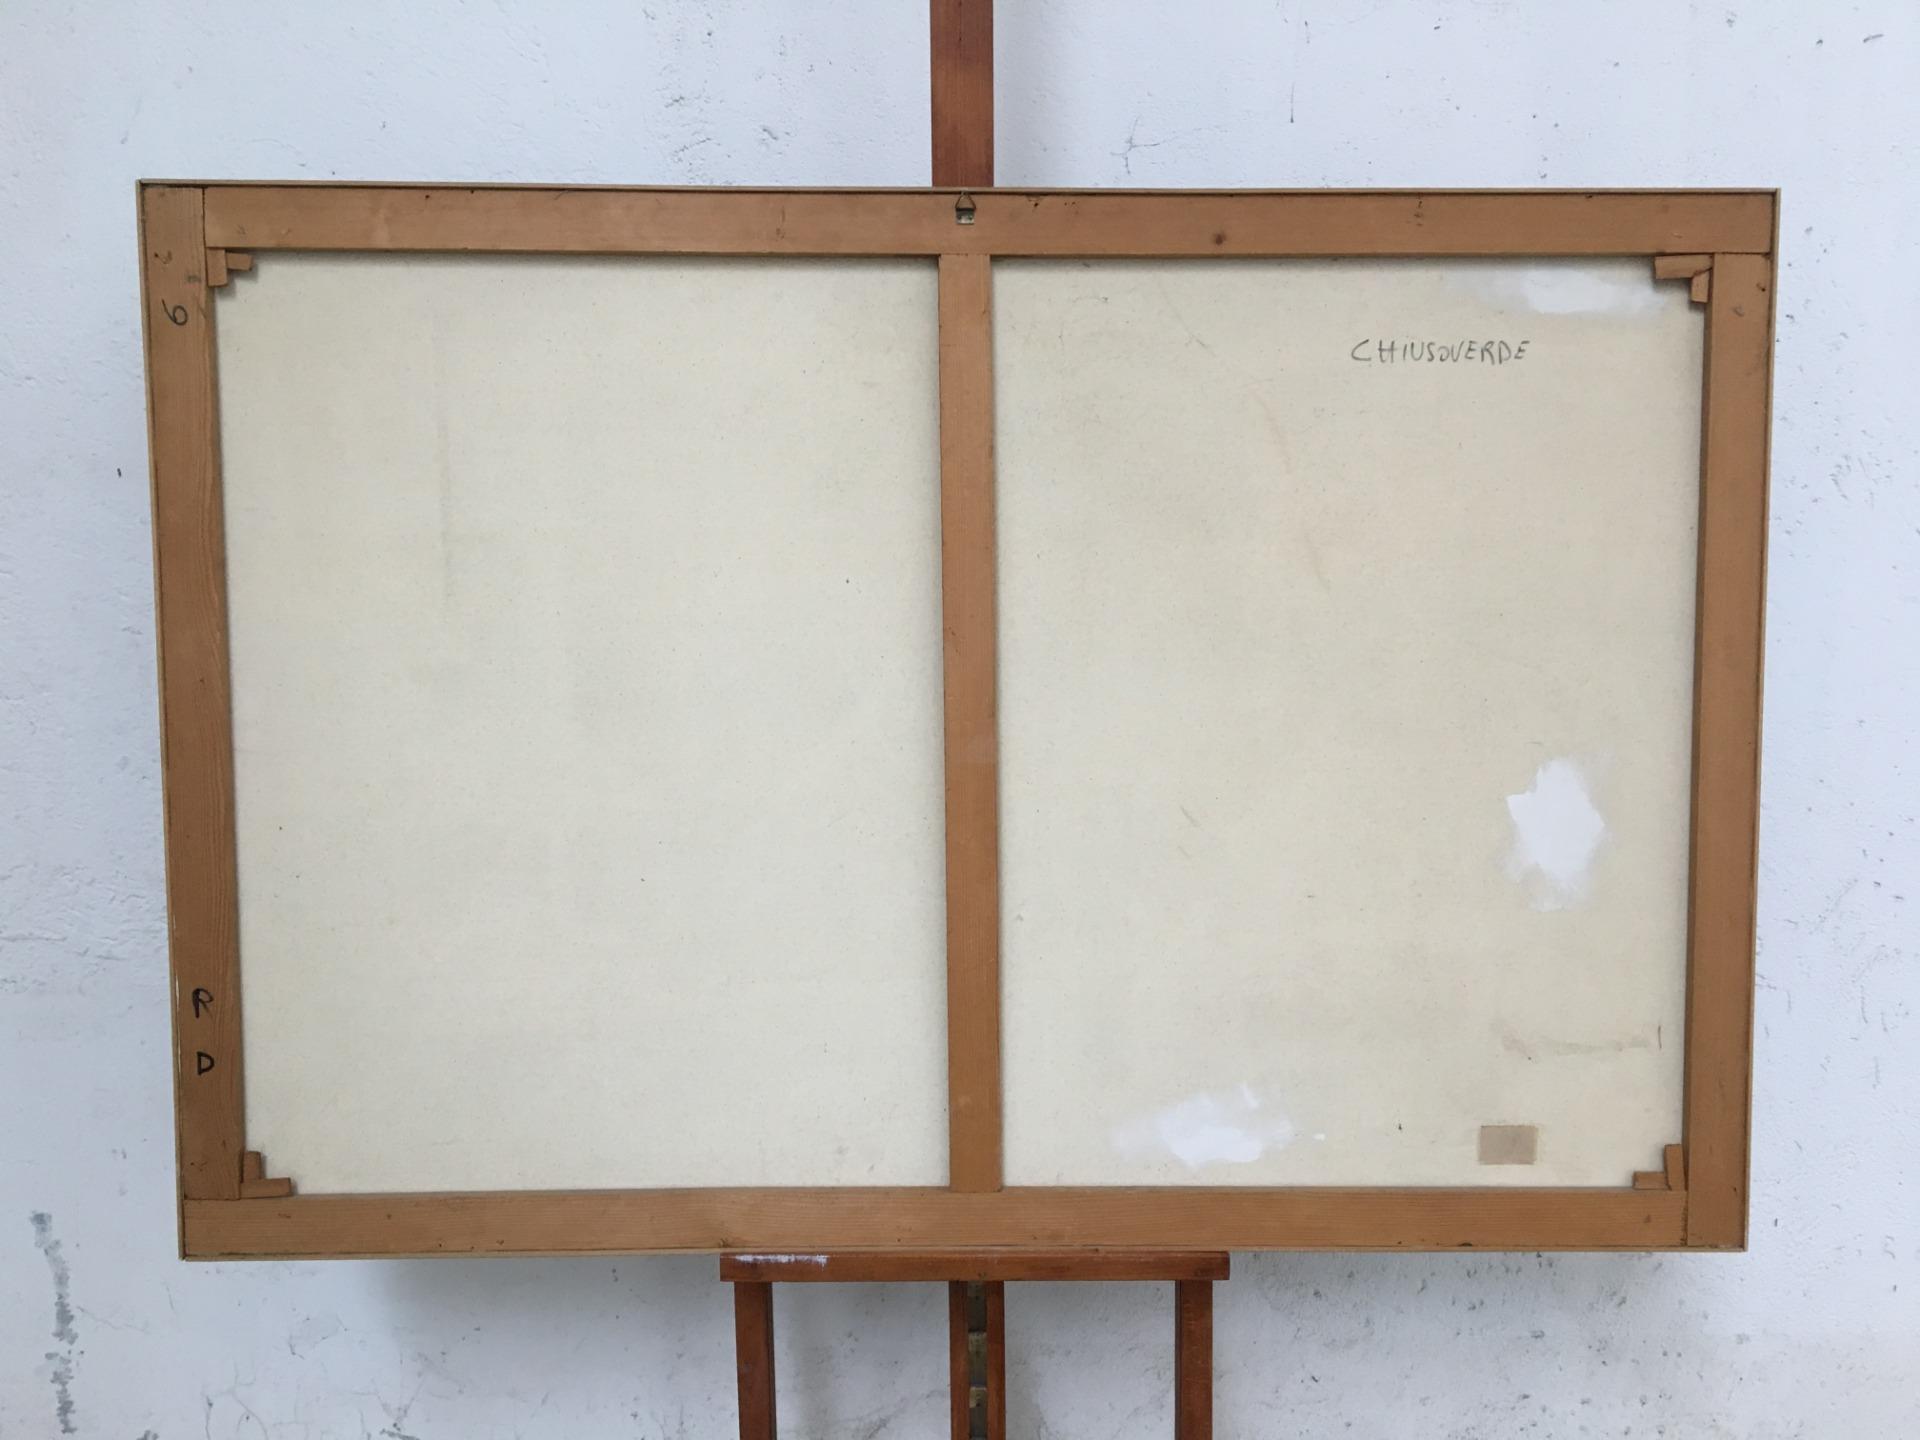 "thumb8|G.L. BELLORINI "" CHIUSO VERDE """